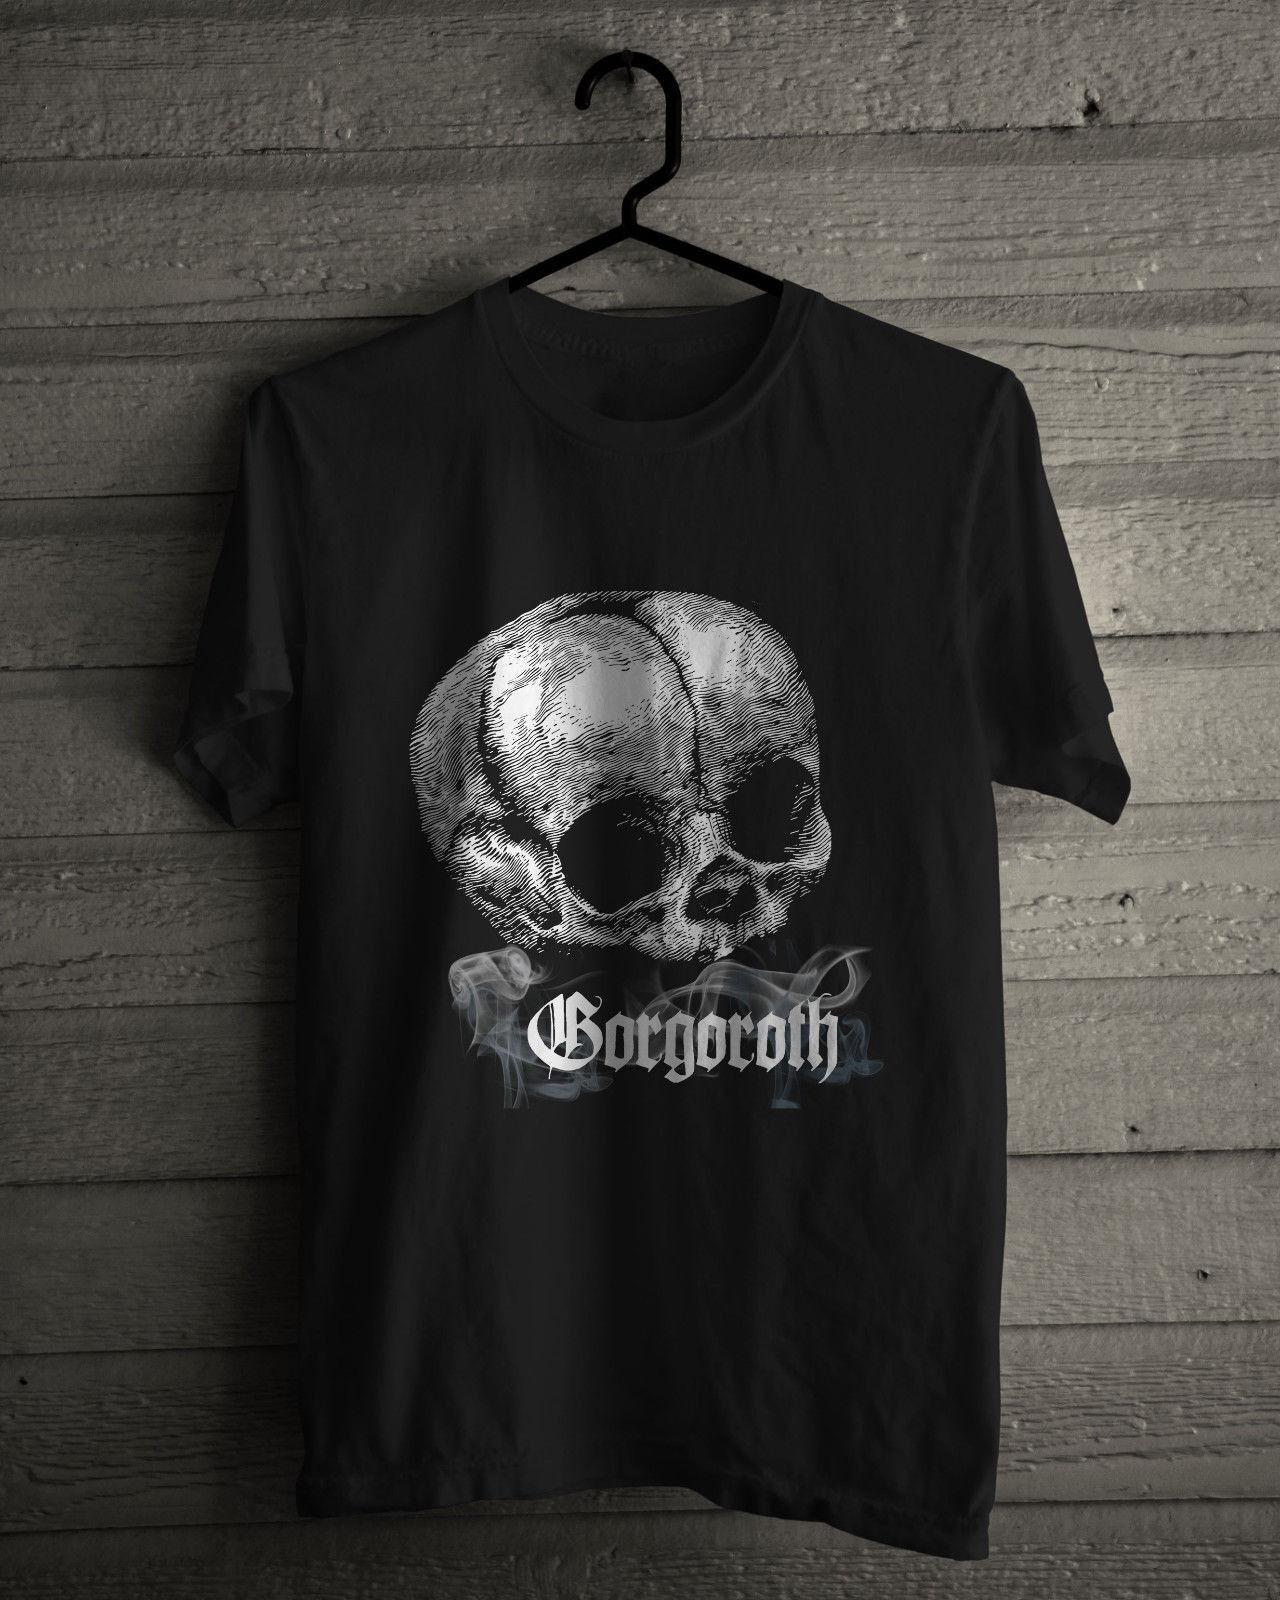 Free Shipping!Vintage Gorgoroth T-shirt/Black Metal T-shirt/Metal T-shirt/Band T-shirt/Gorgoroth T-shirt/Gorgoroth Tour C6zSUj68t